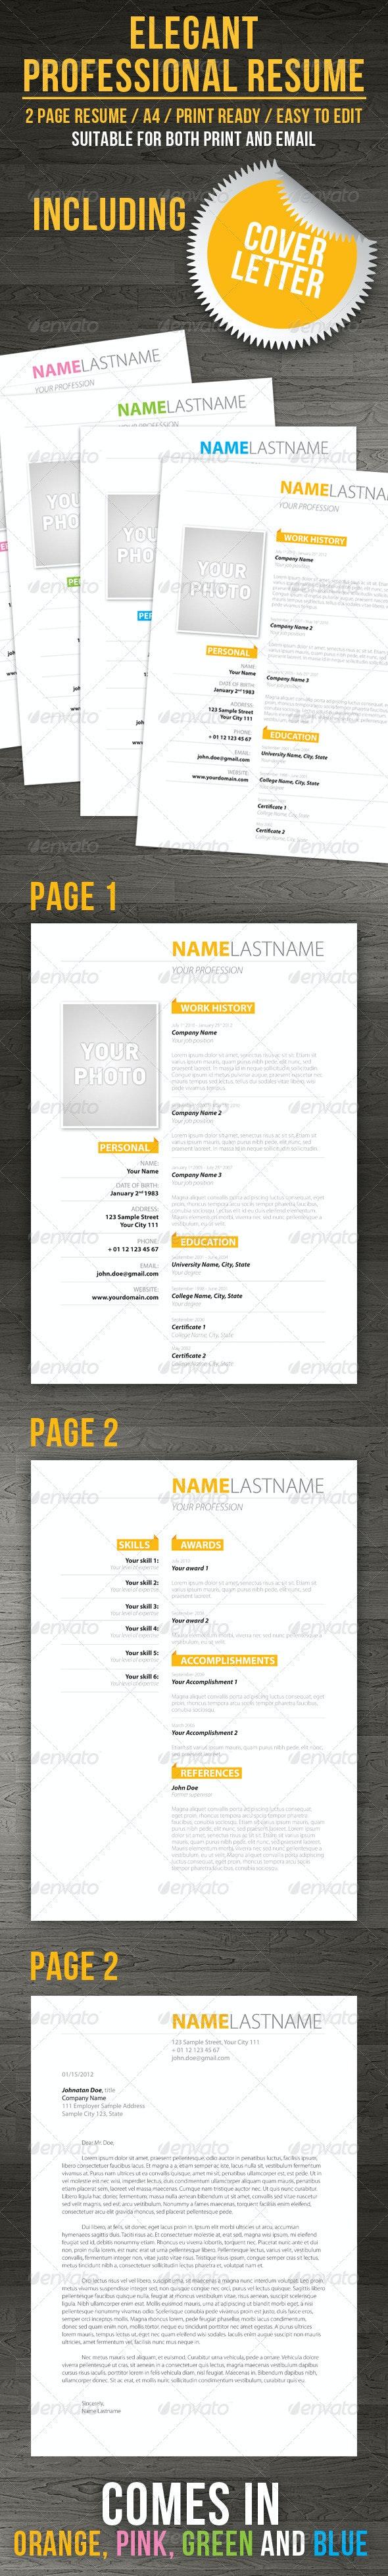 Elegenat Professional Resume + Cover Letter - Resumes Stationery